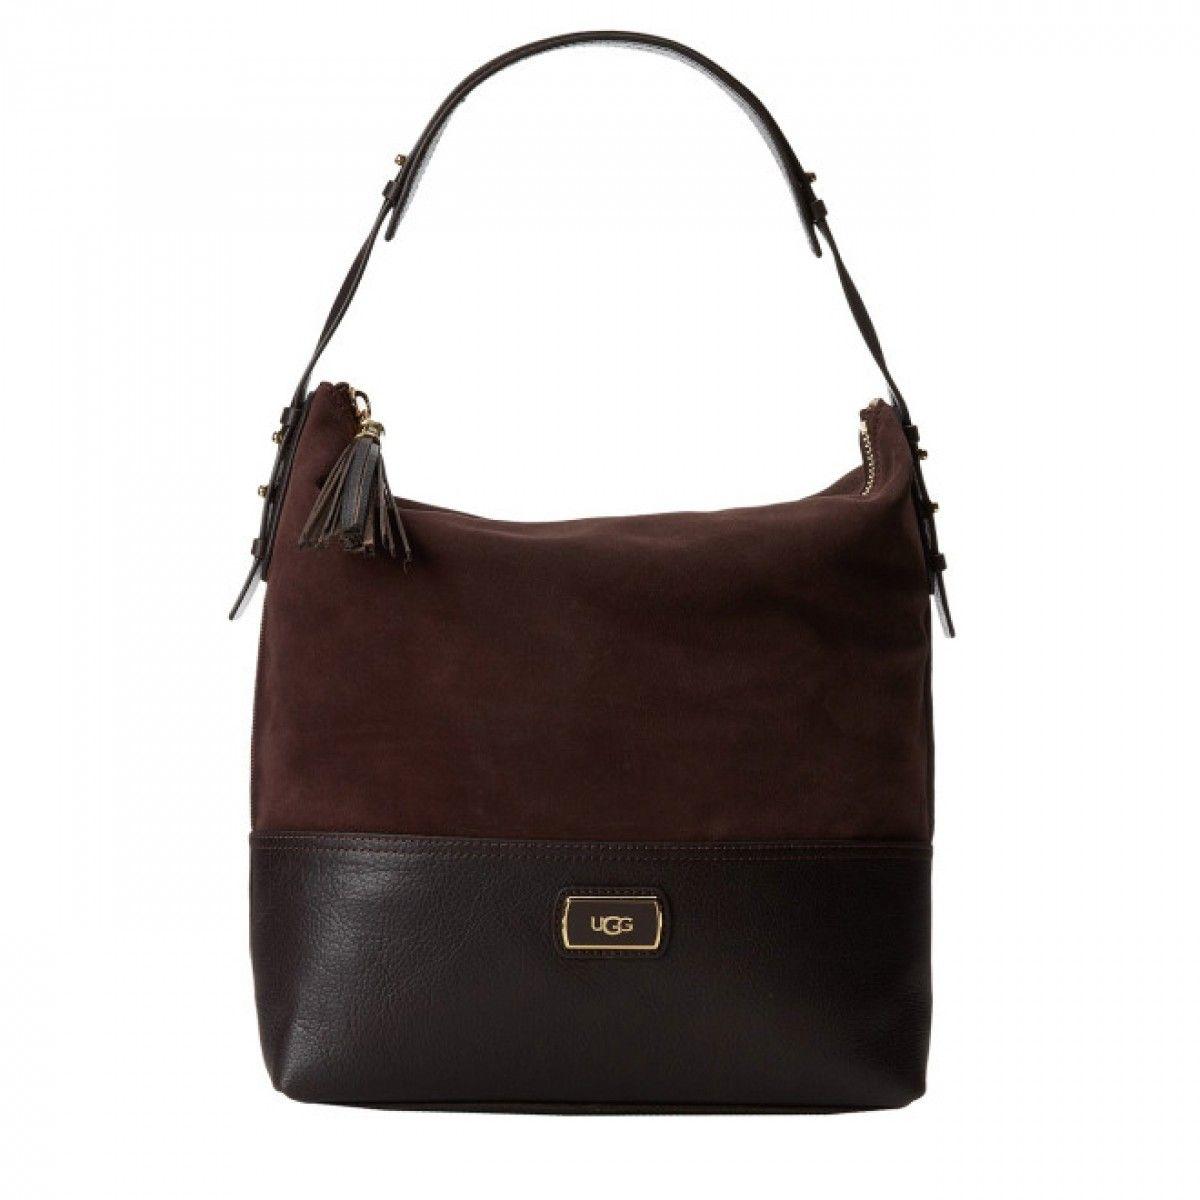 3507f216791ca UGG AUSTRALIA Handtasche Millie Hobo Kaffebraun